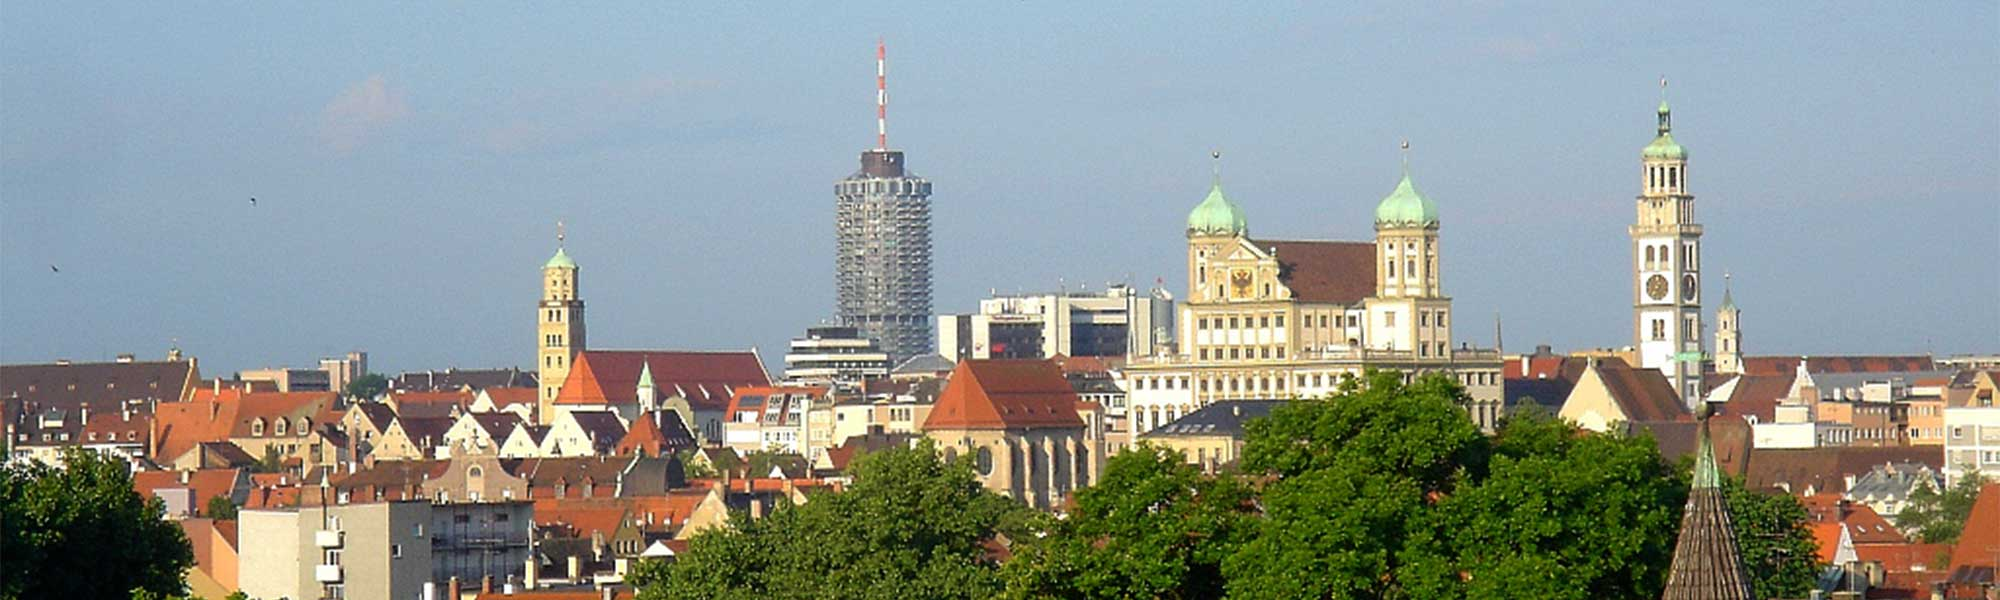 Sightrunning Augsburg